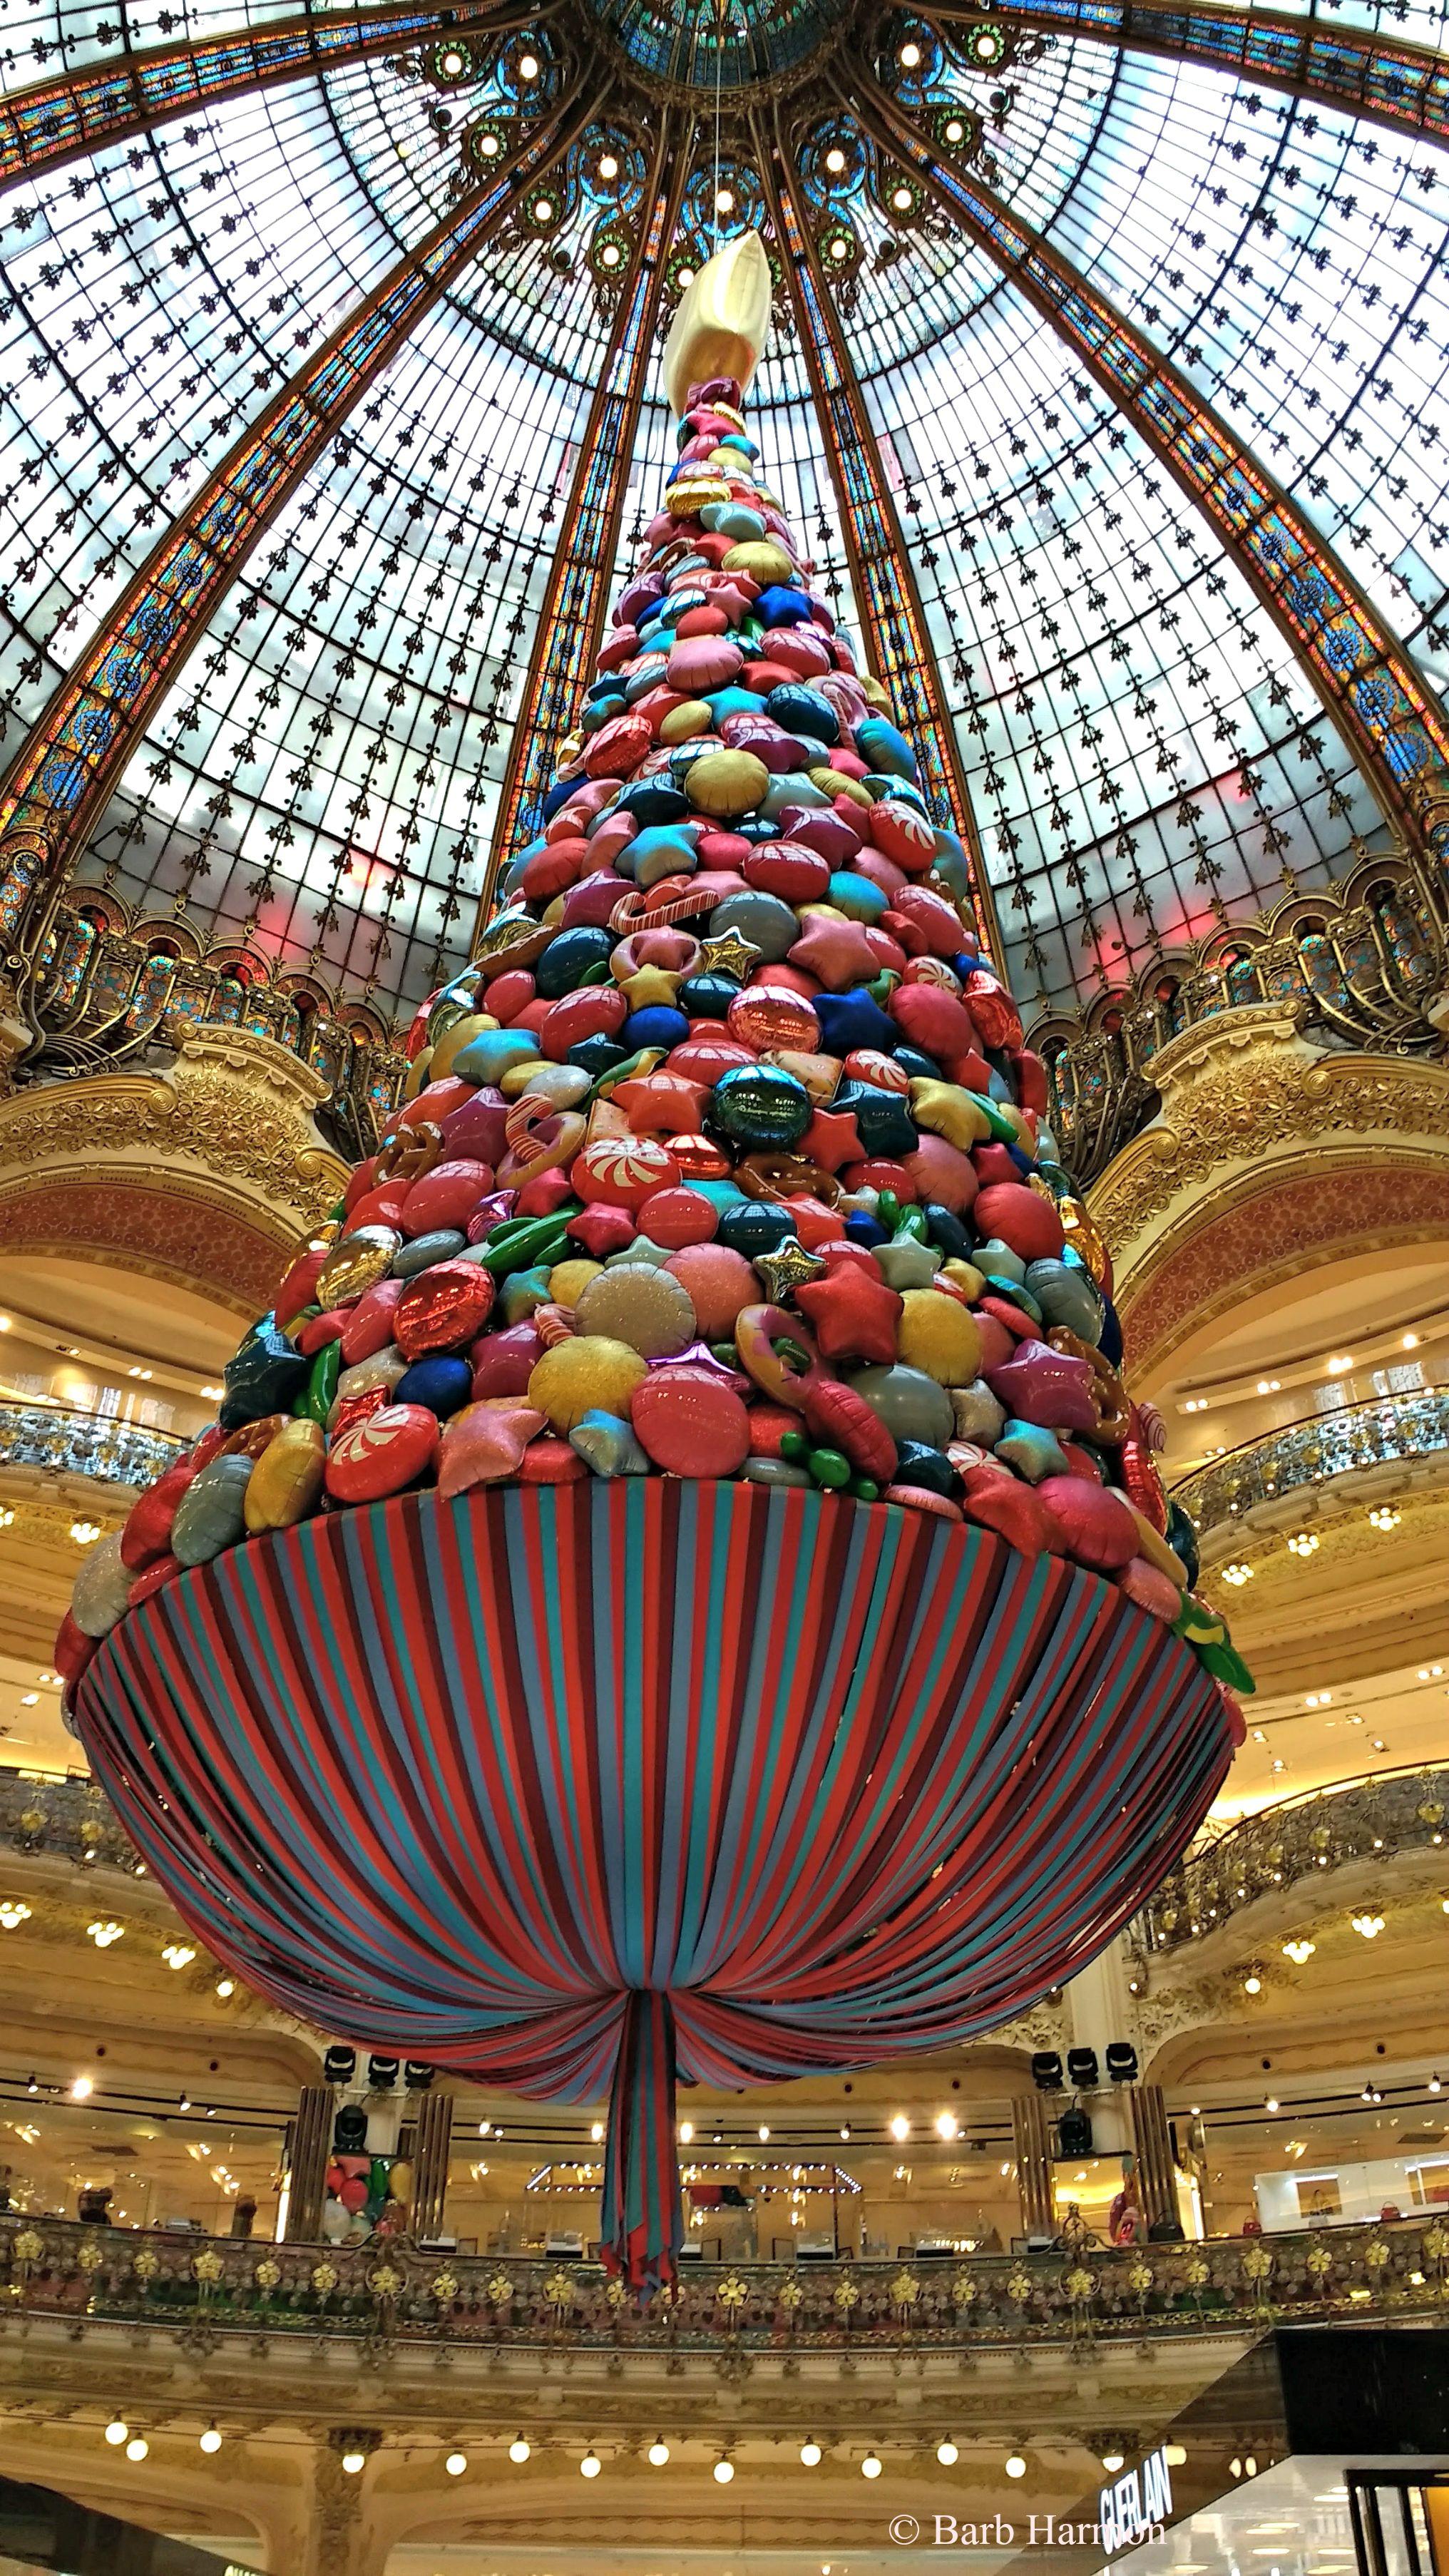 Christmas 2017 At Galeries Lafayette Paris Christmasinparis Galerieslafayette Lafayette Paris Christmas In Paris Paris Images